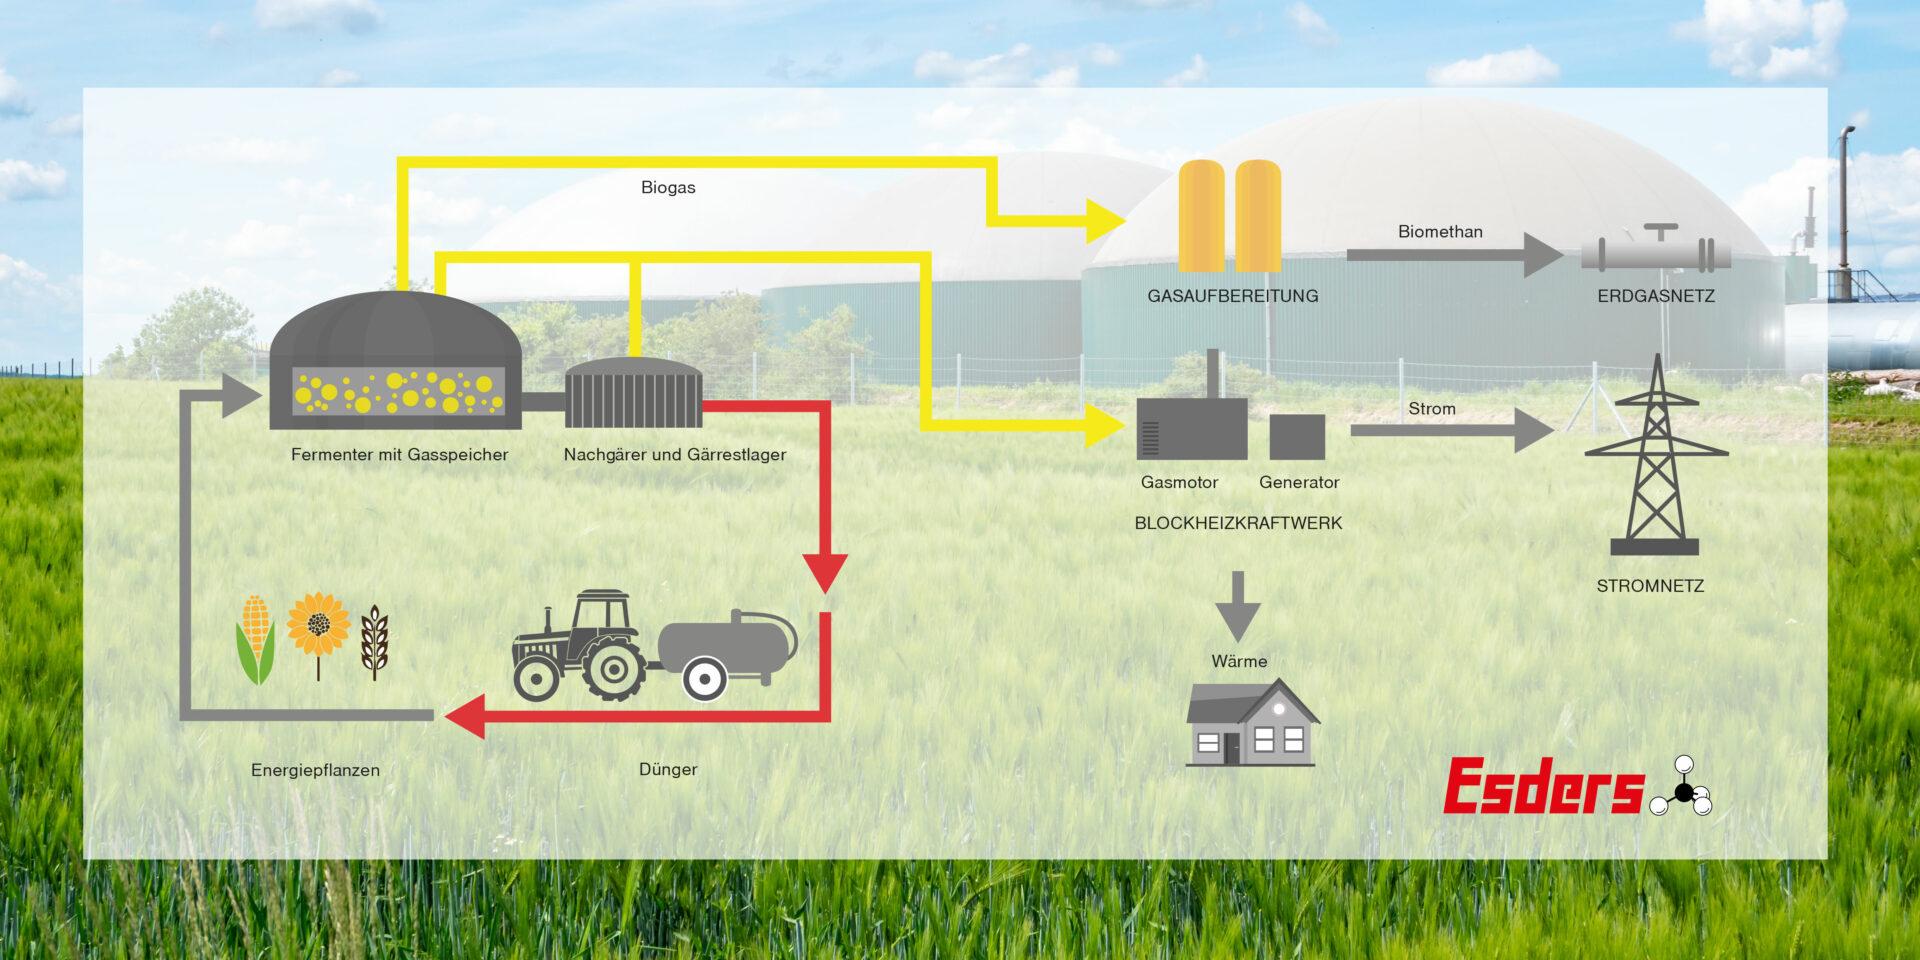 Biogasanlage-Aufbau-Grafik